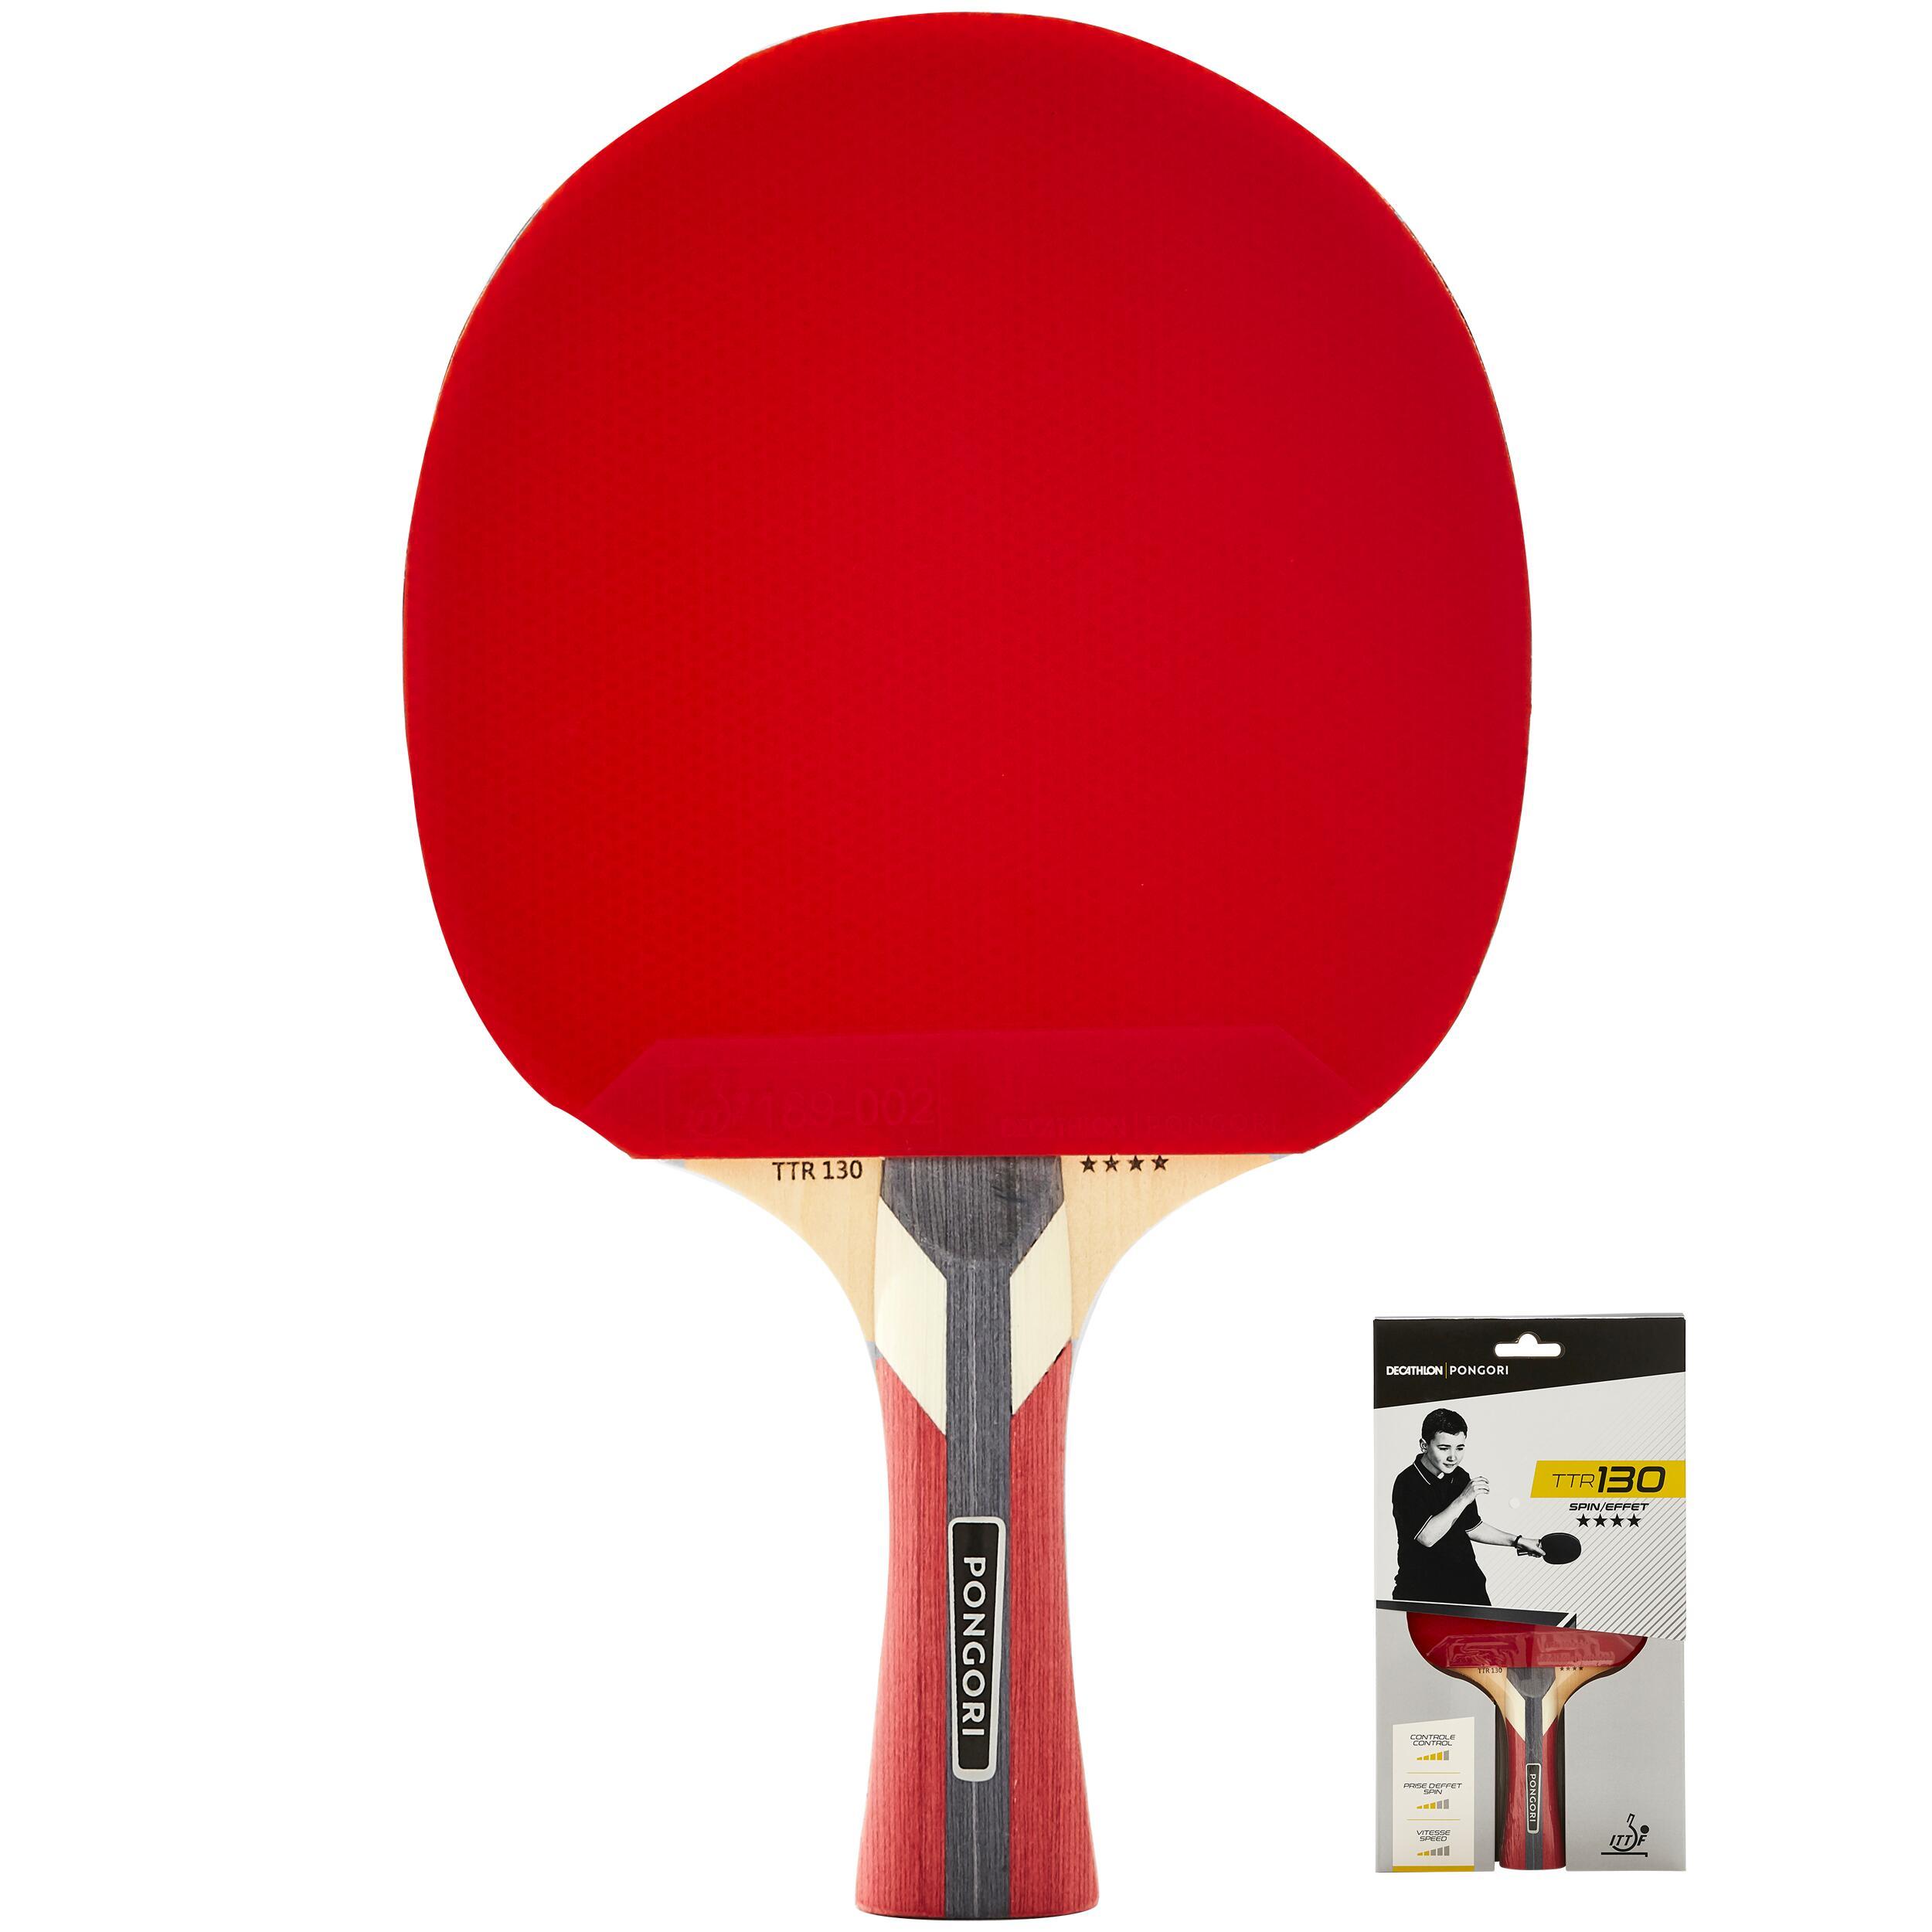 Paletă Tenis TTR130 4* SPIN imagine